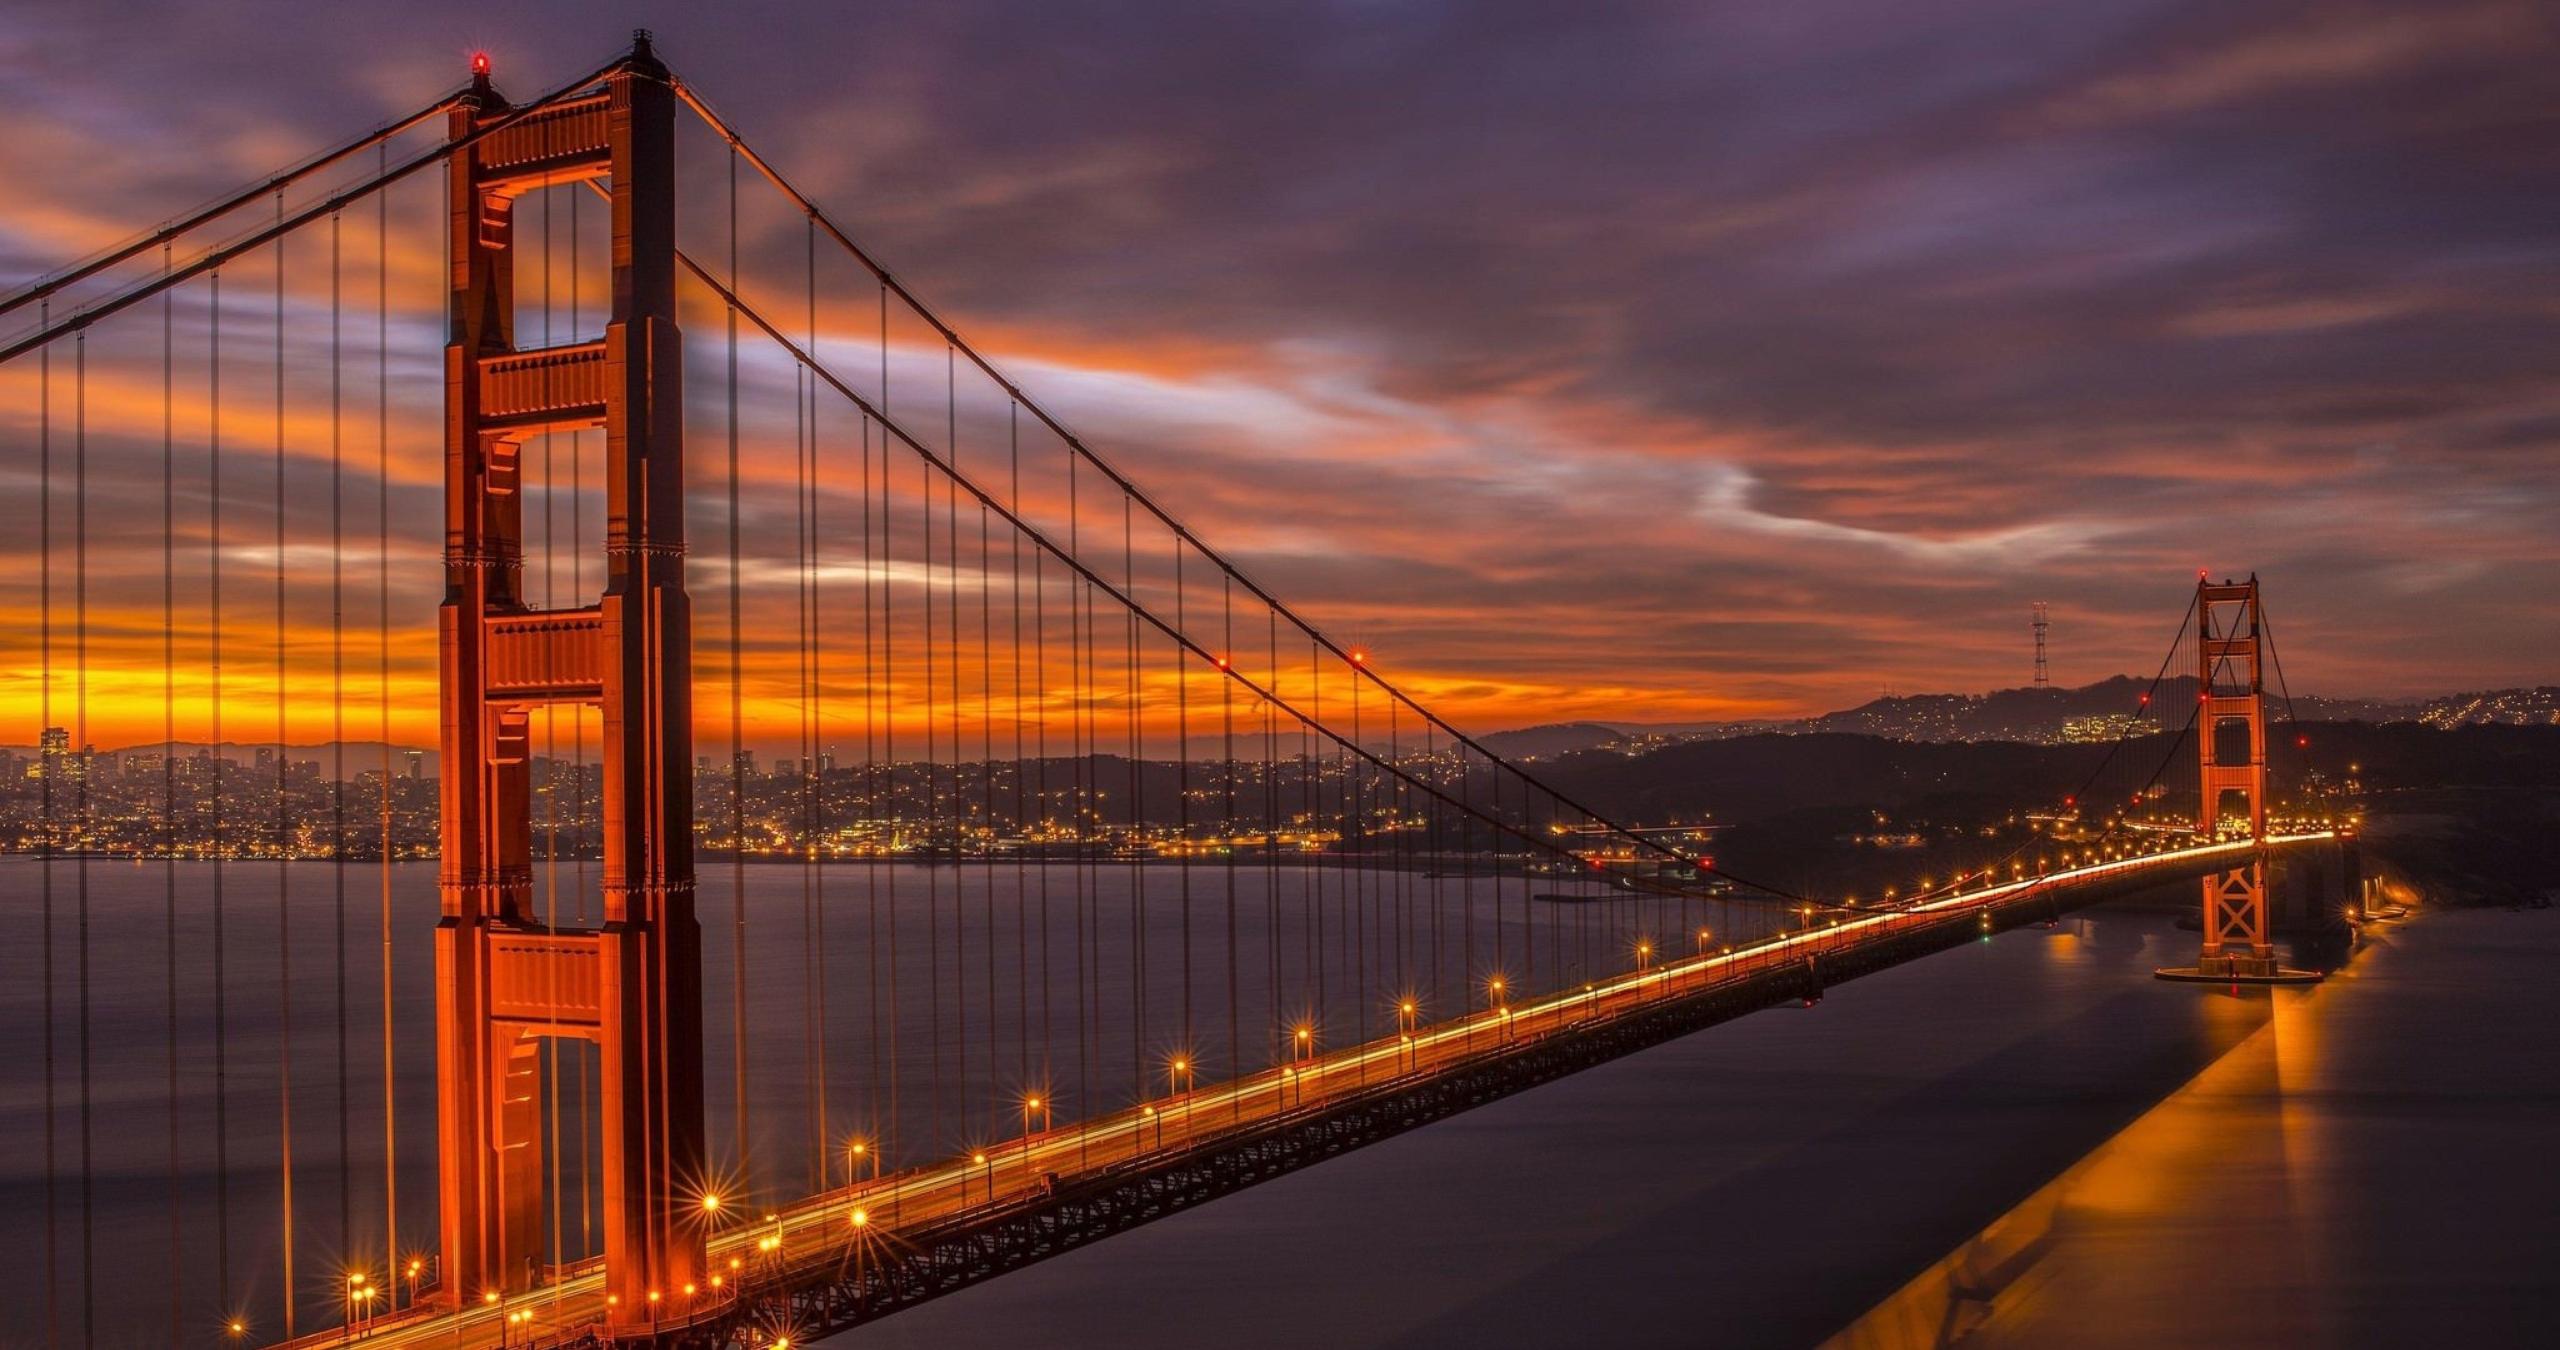 4k San Francisco Wallpaper amazing variety of colors